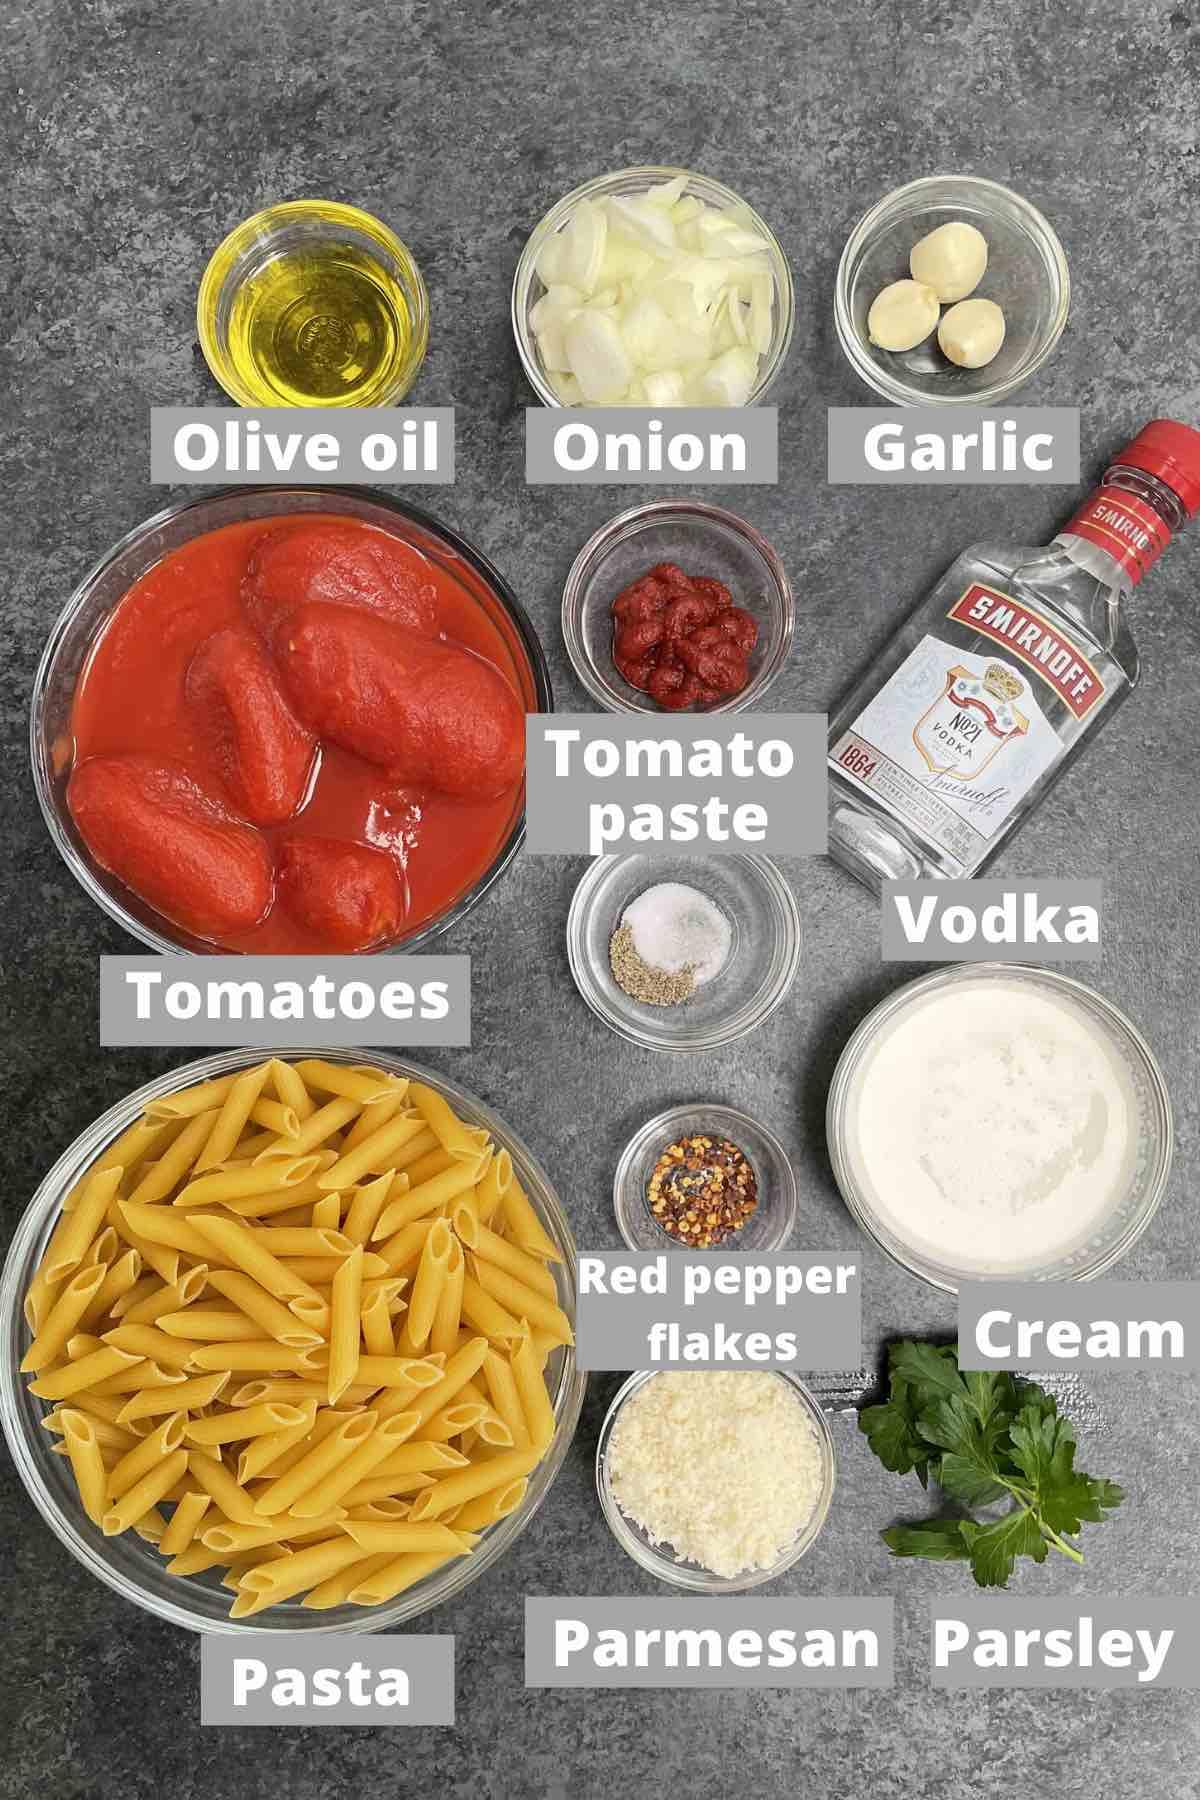 Ingredients for vodka sauce